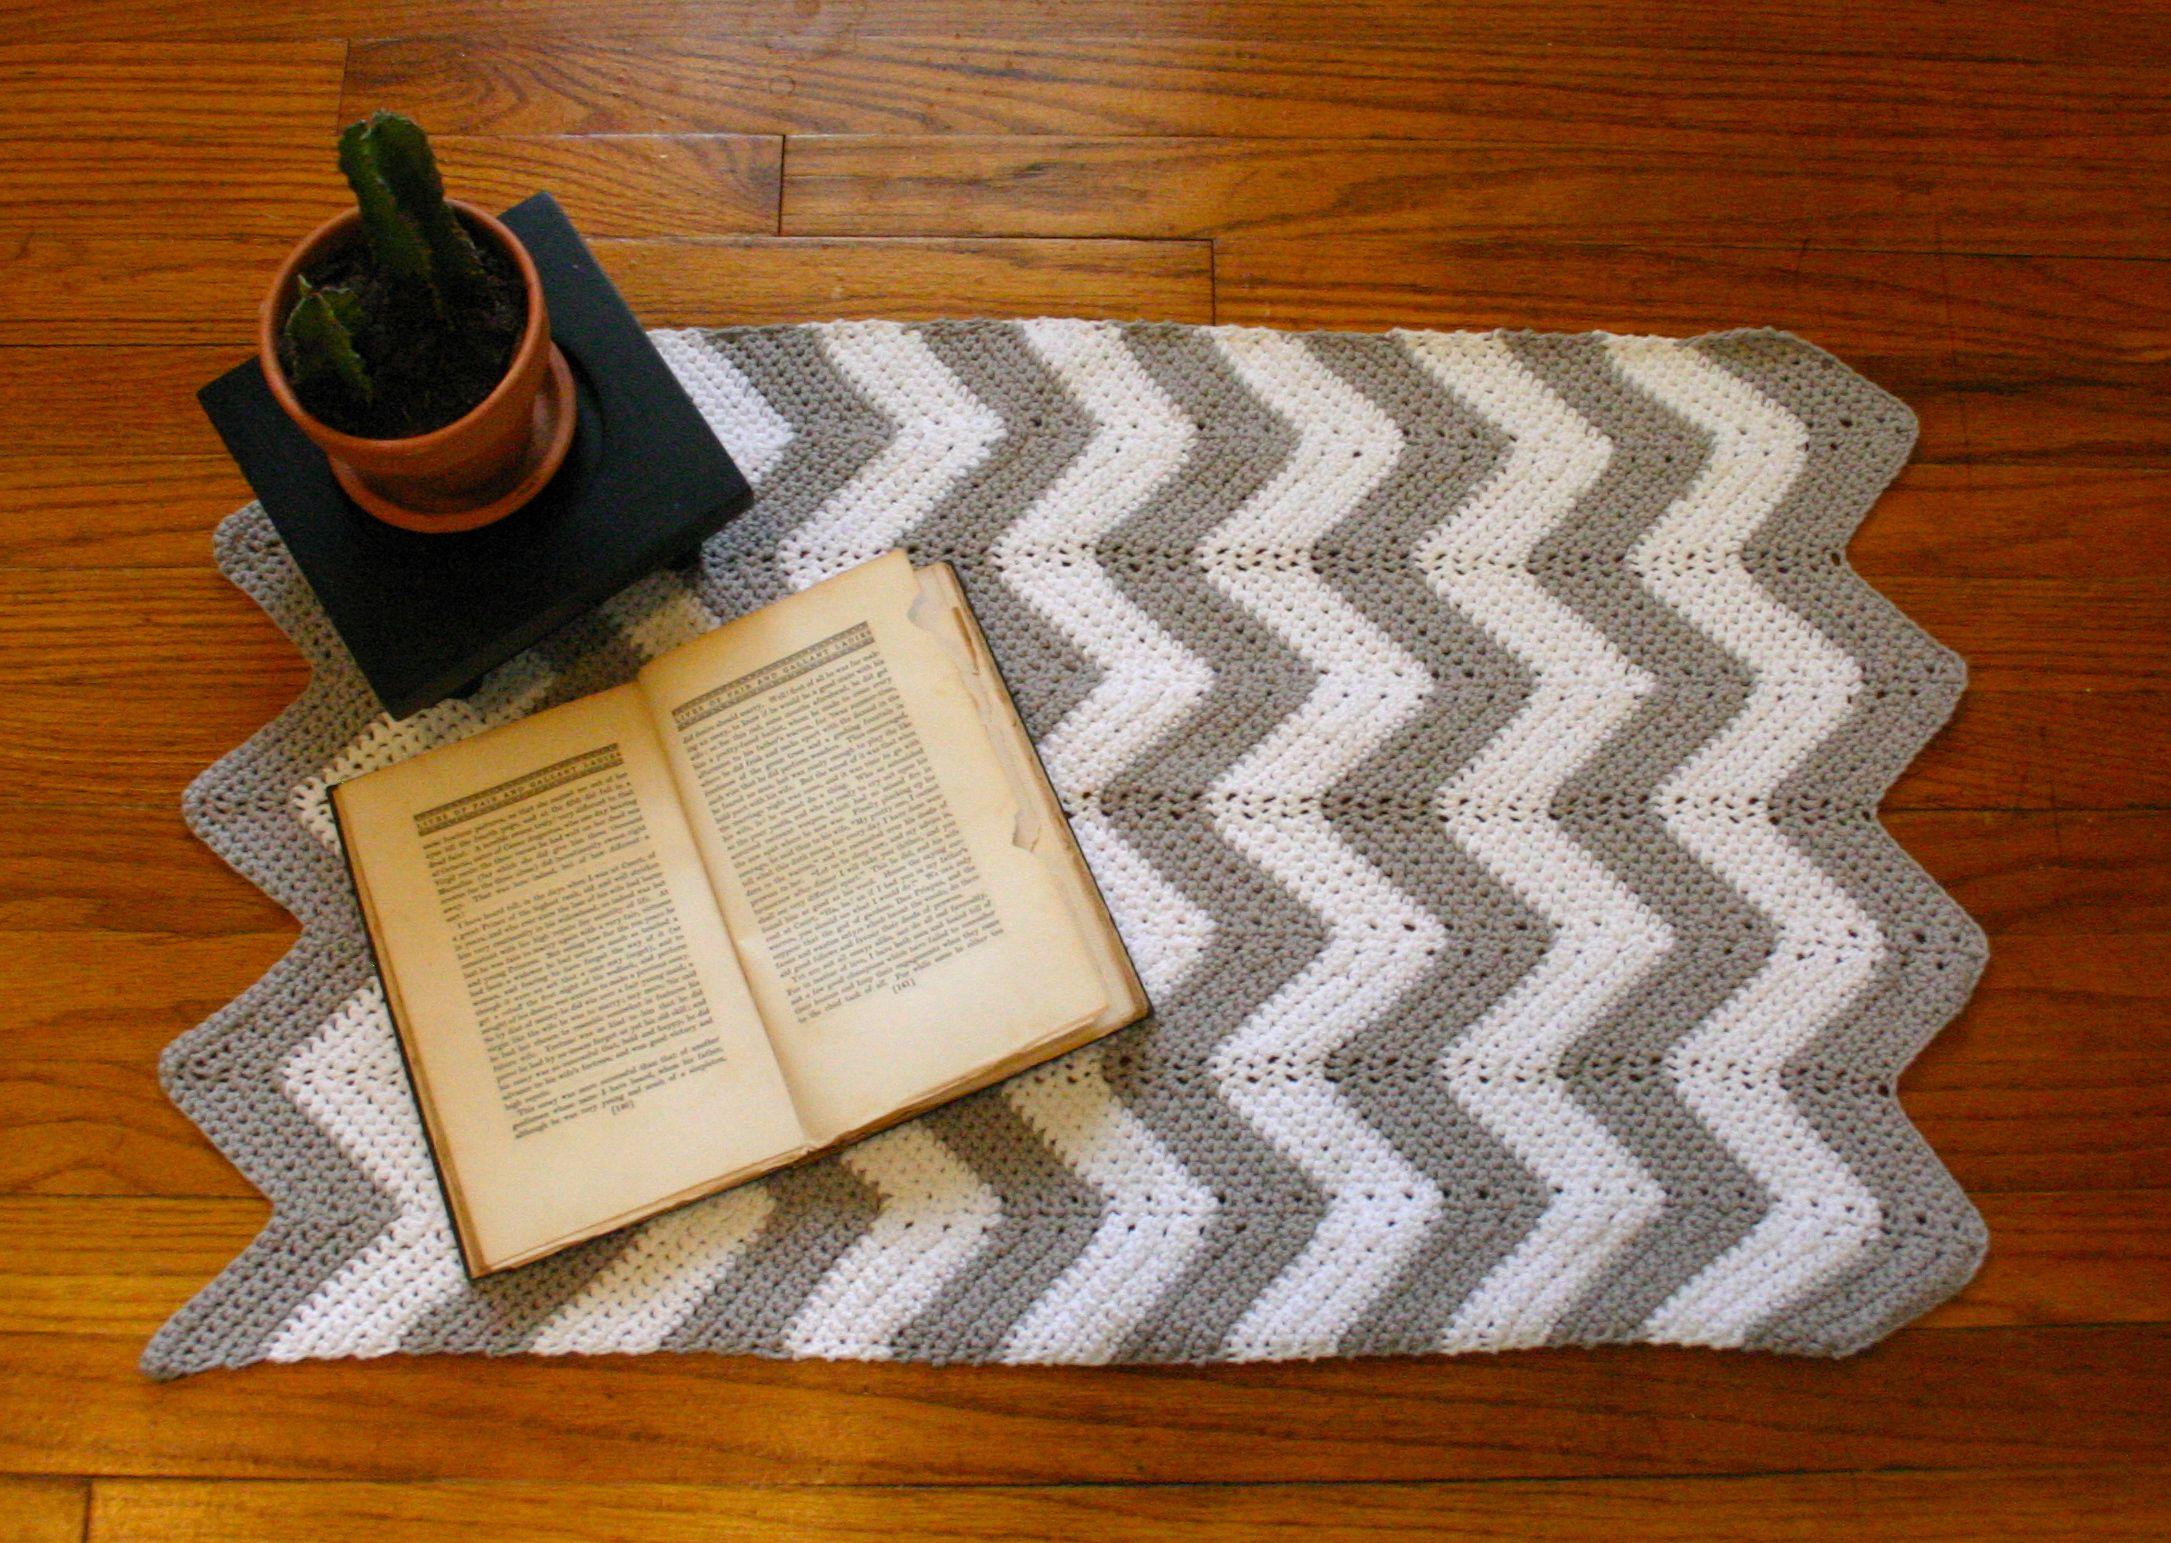 Crochet Pattern For Zig Zag Rug : crochet Love Is All You Knit